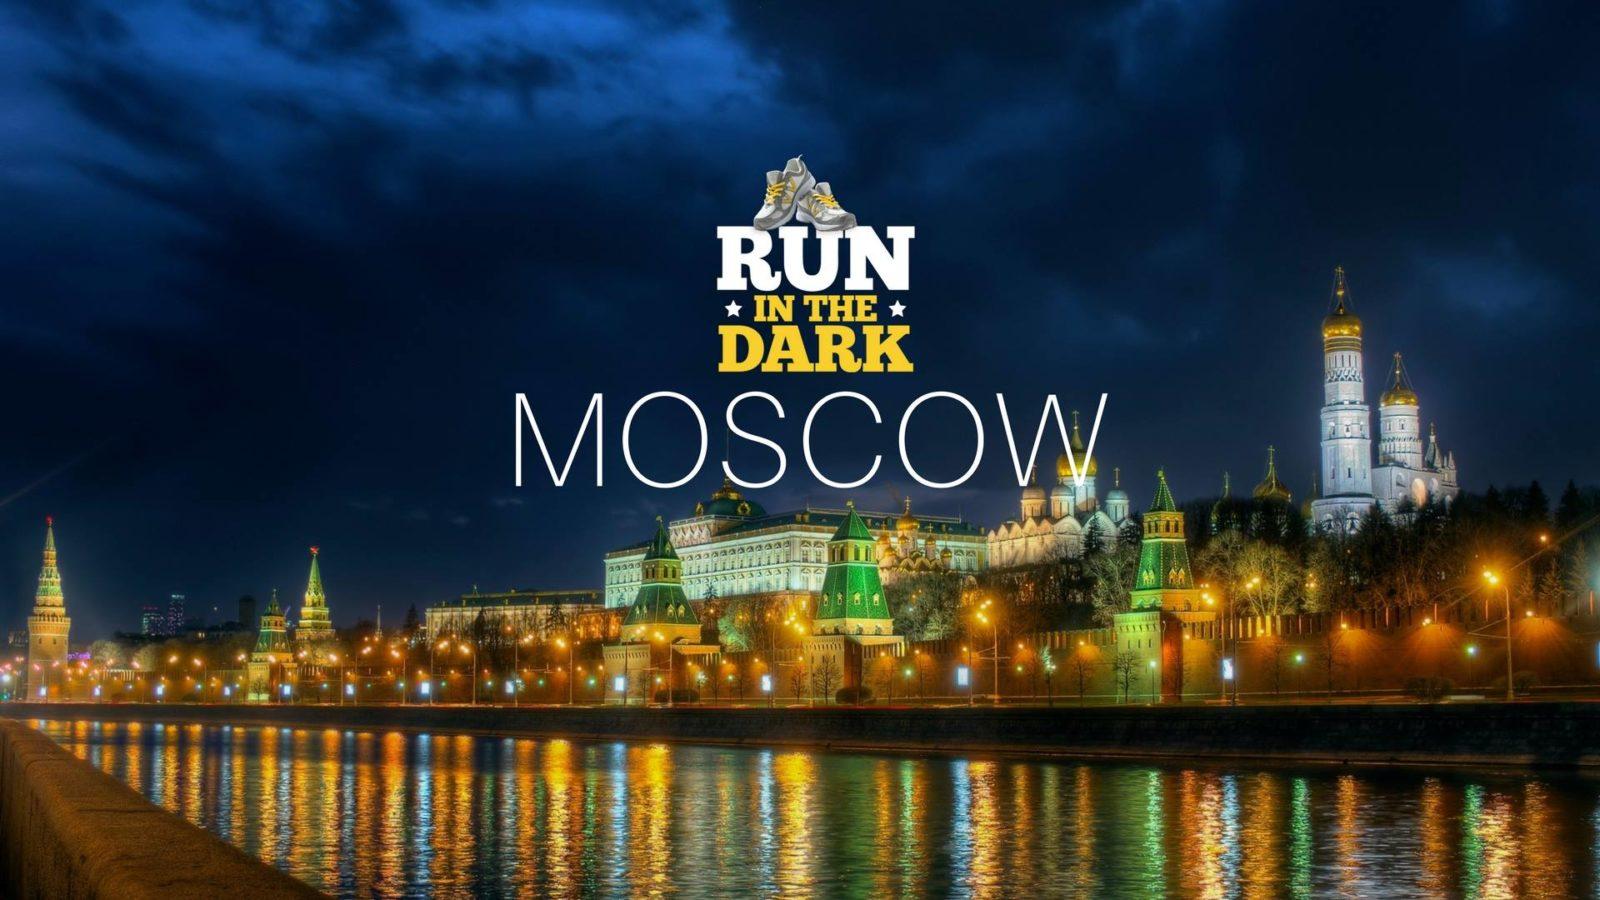 RUN IN THE DARK ПО-МОСКОВСКИ